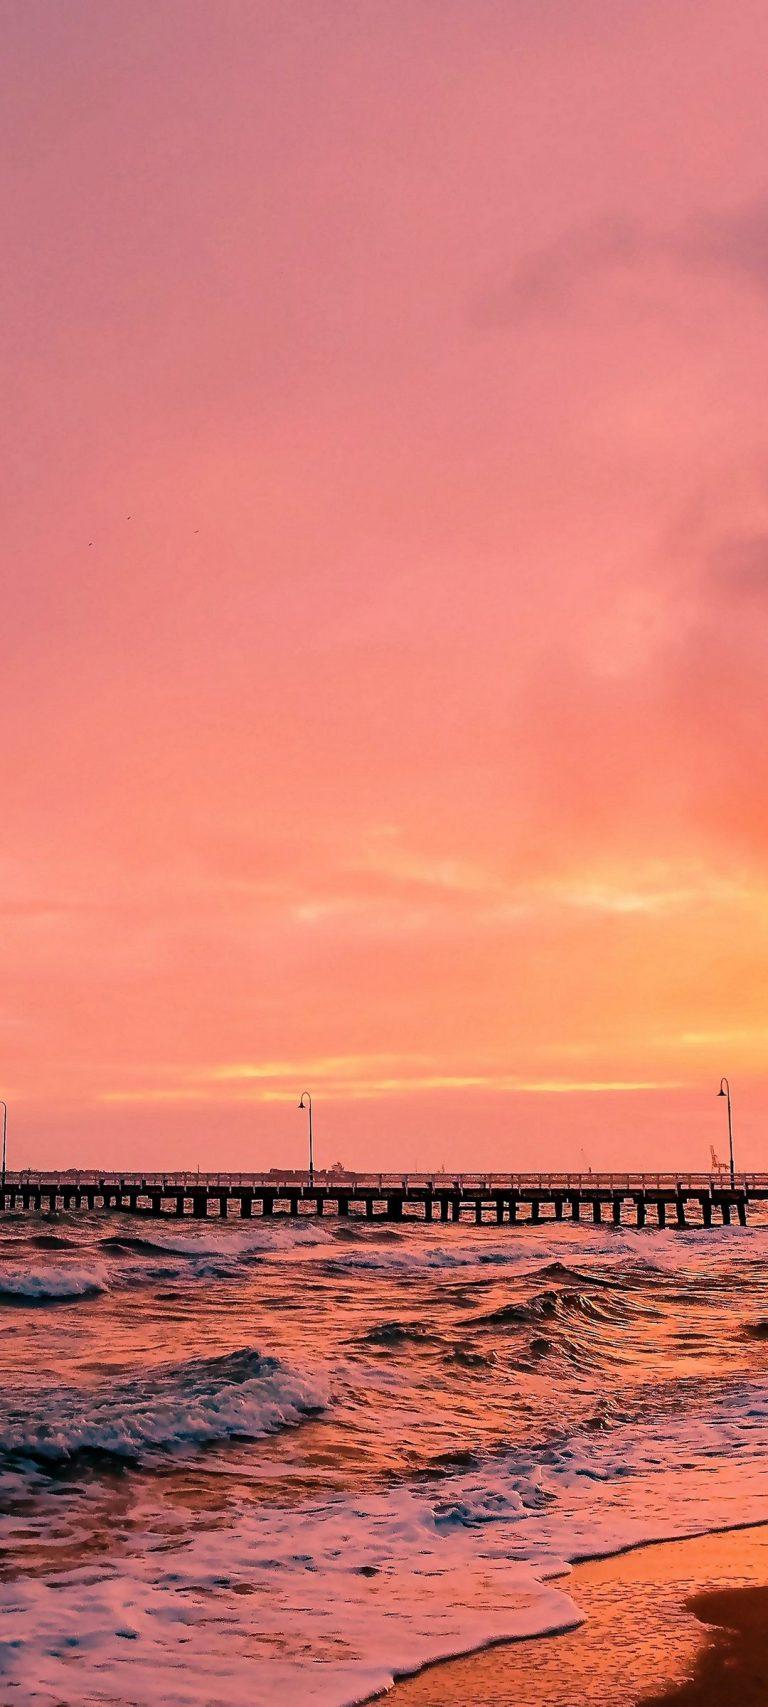 Sunset Sea Sun Landscape 1080x2400 768x1707